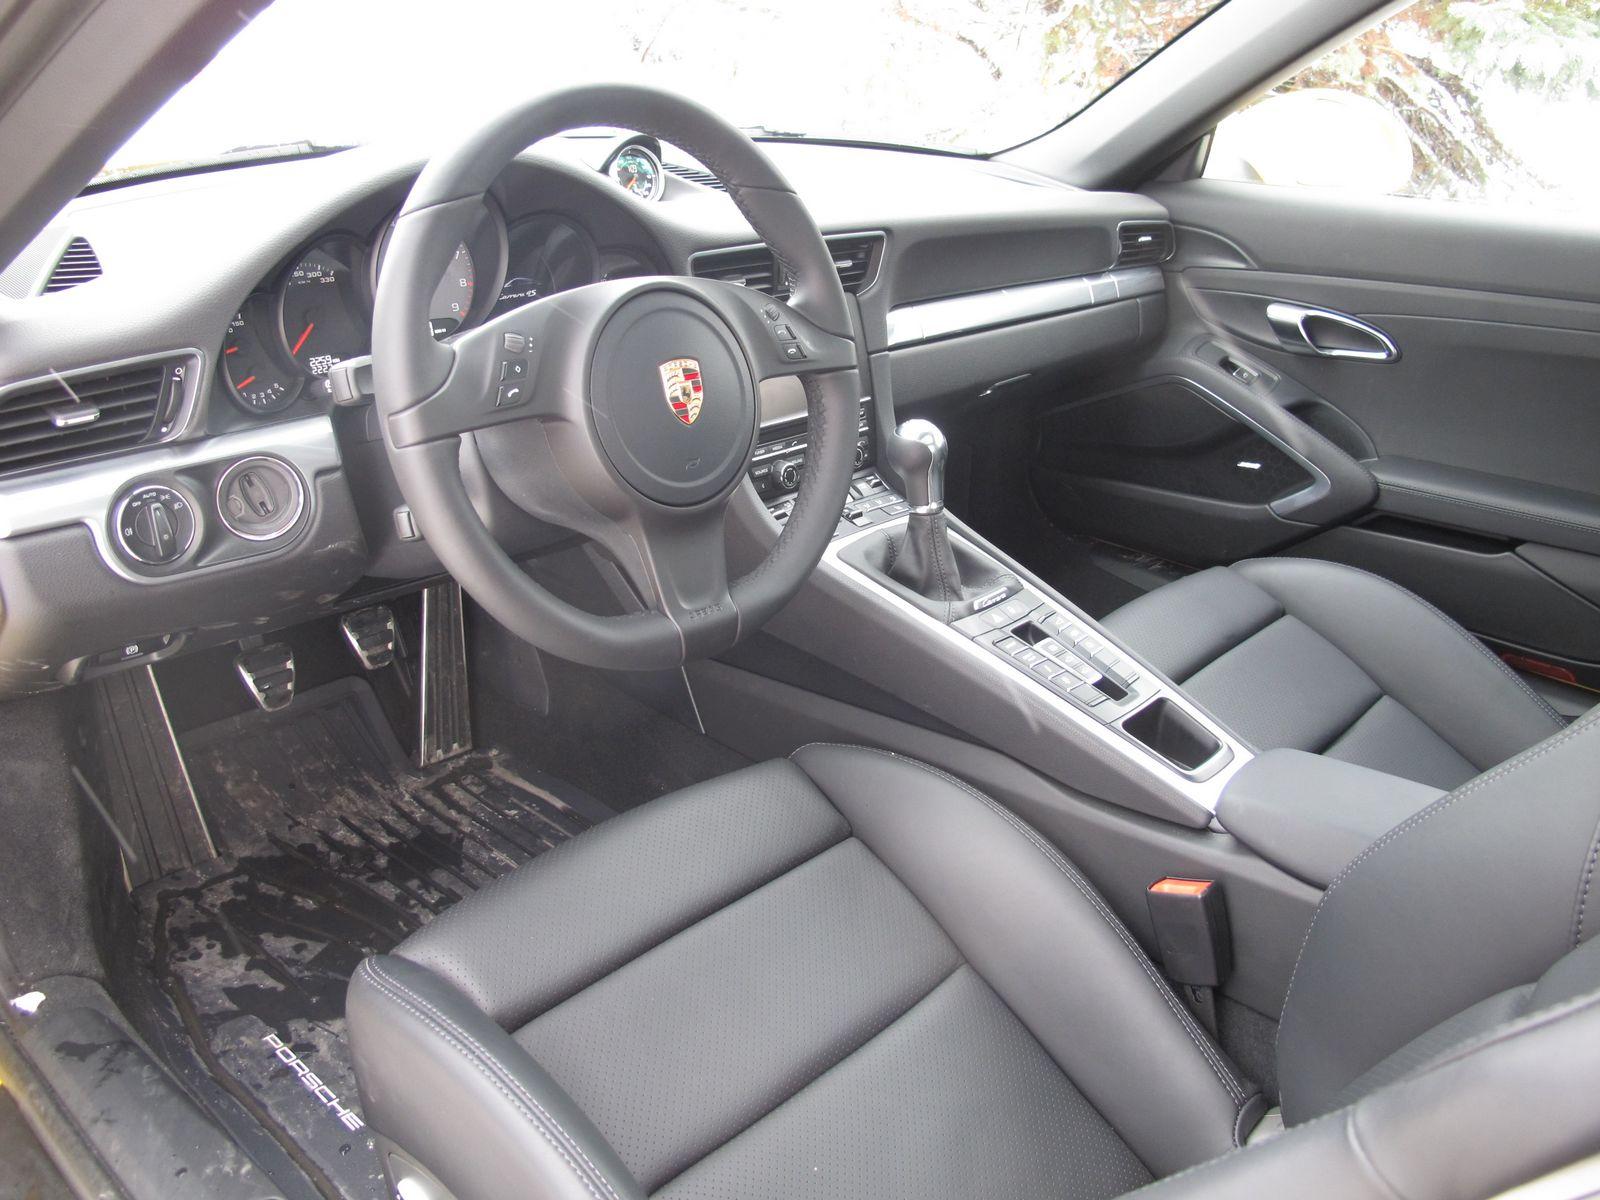 2013-porsche-911-carrera-4s-006